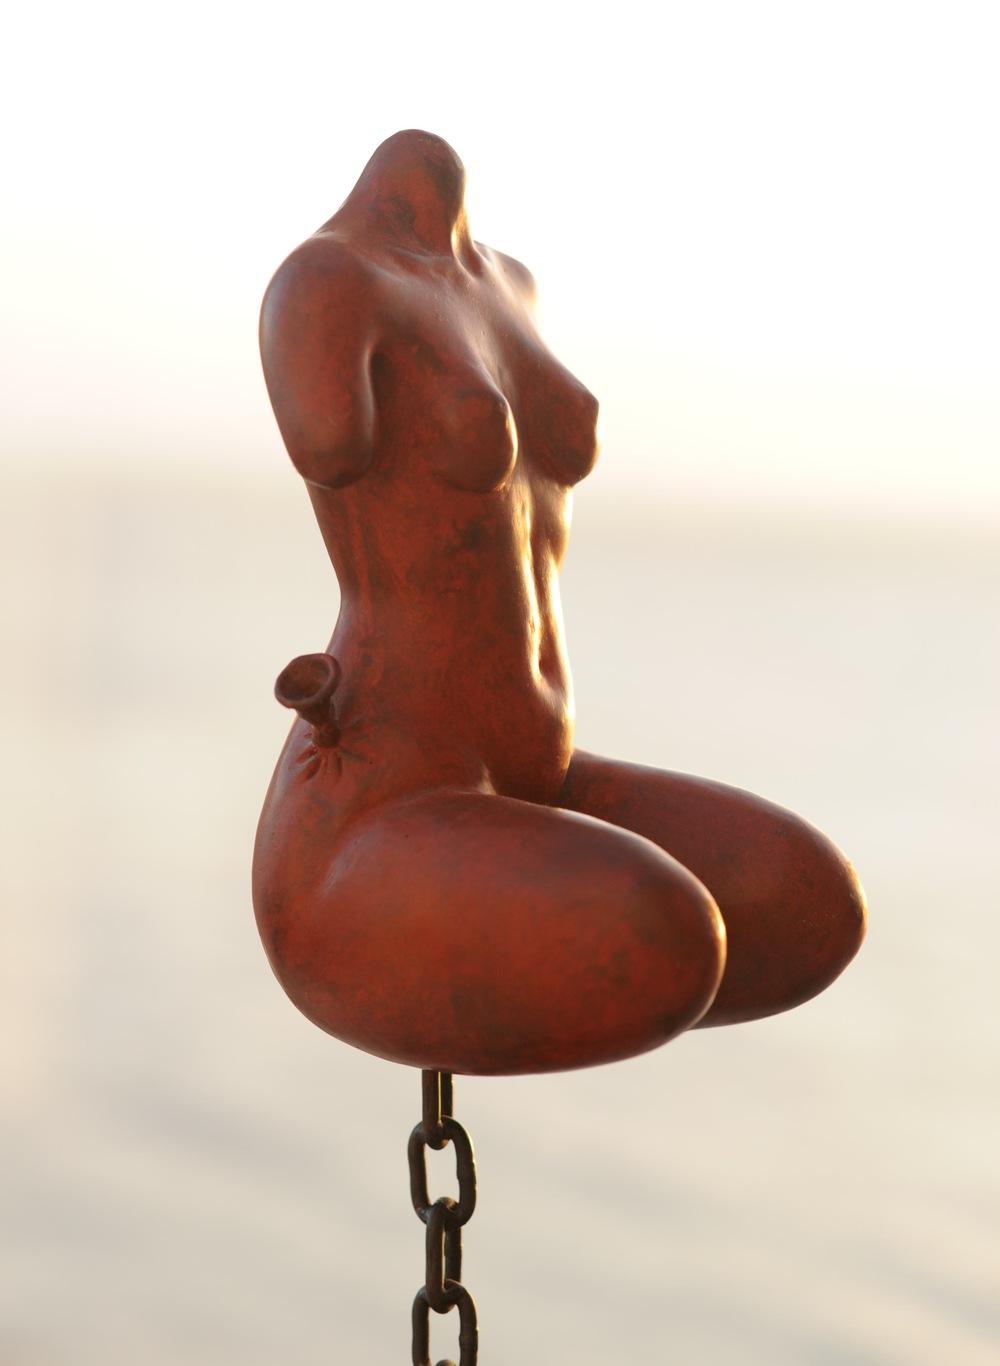 redballoonlady